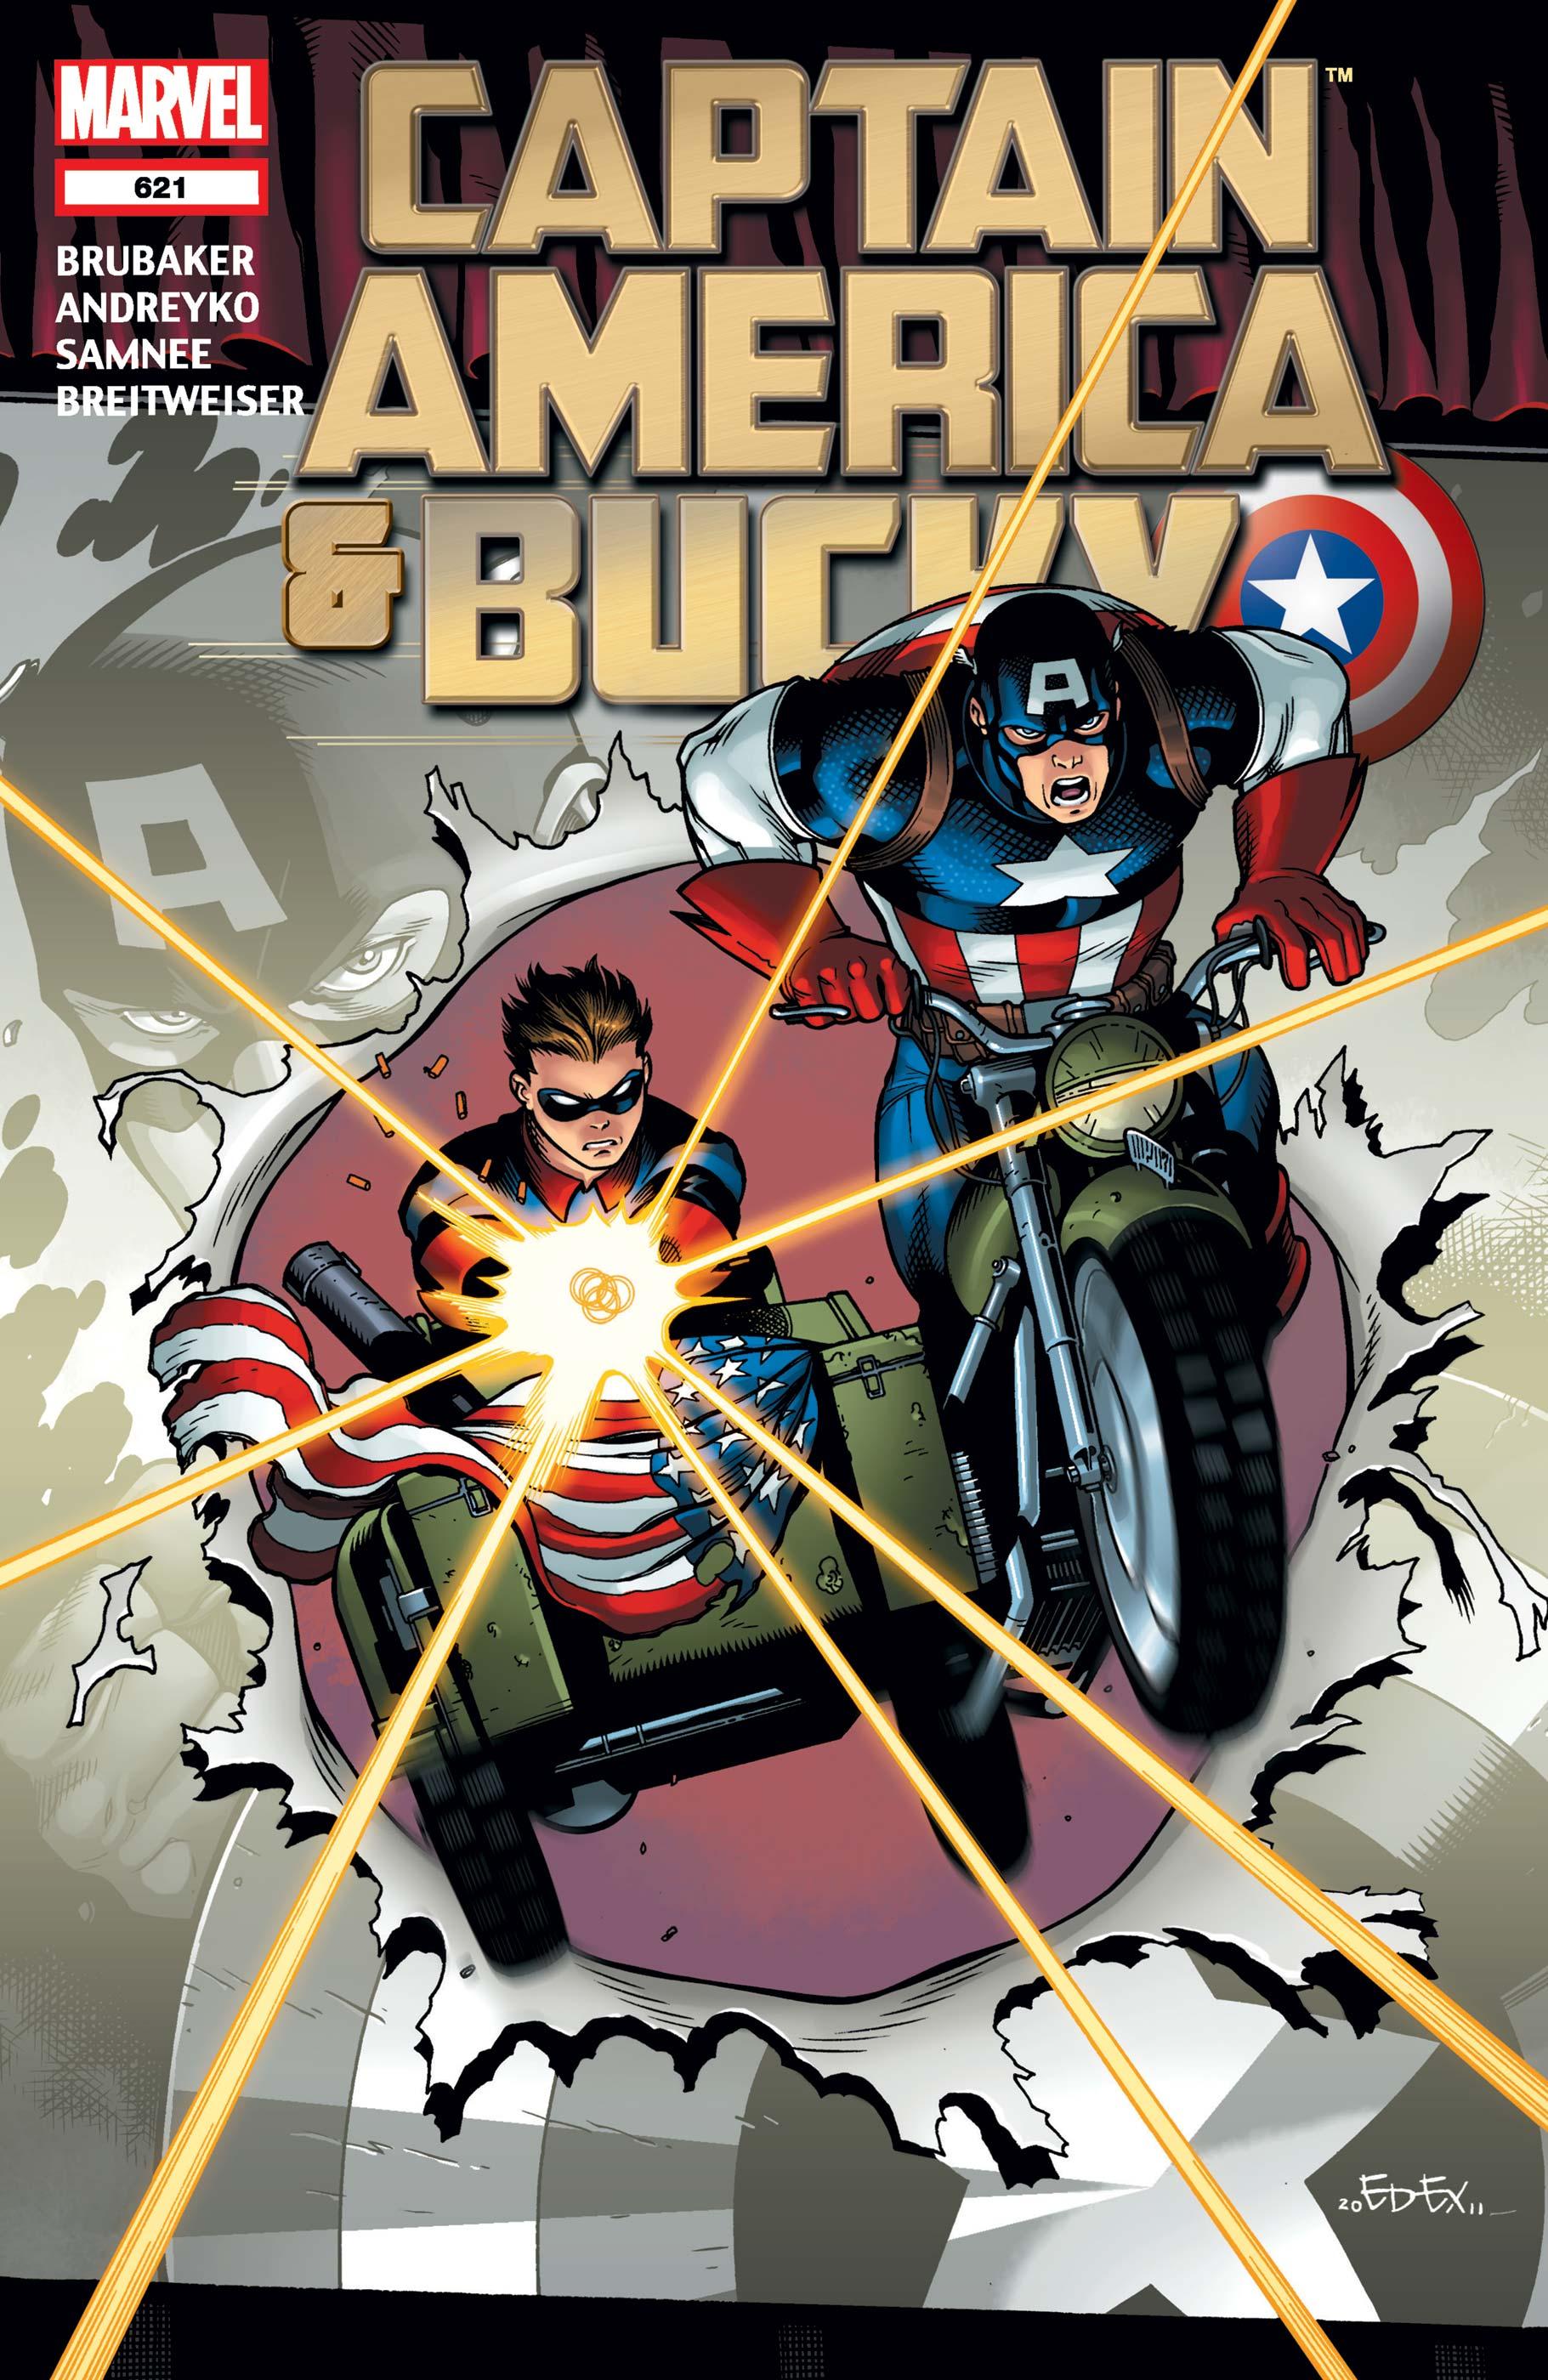 Captain America and Bucky (2011) #621